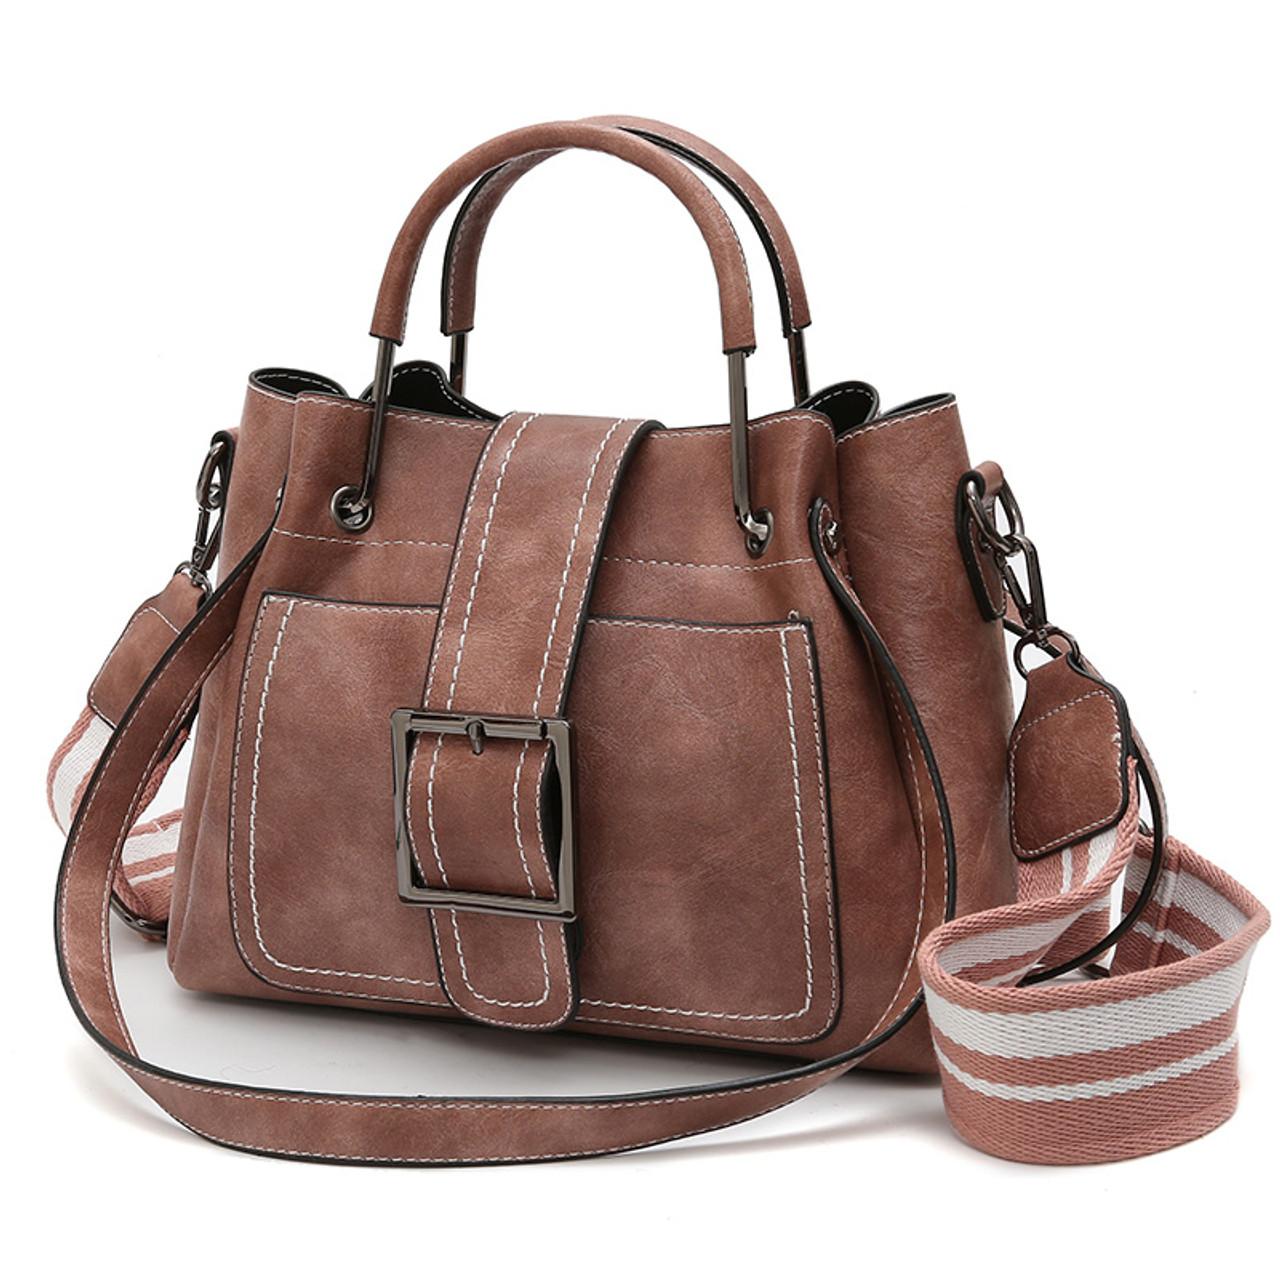 Yogodlns 3pcs Set Oil Wax Leather Women Handbags High Quality Casual Female Bags